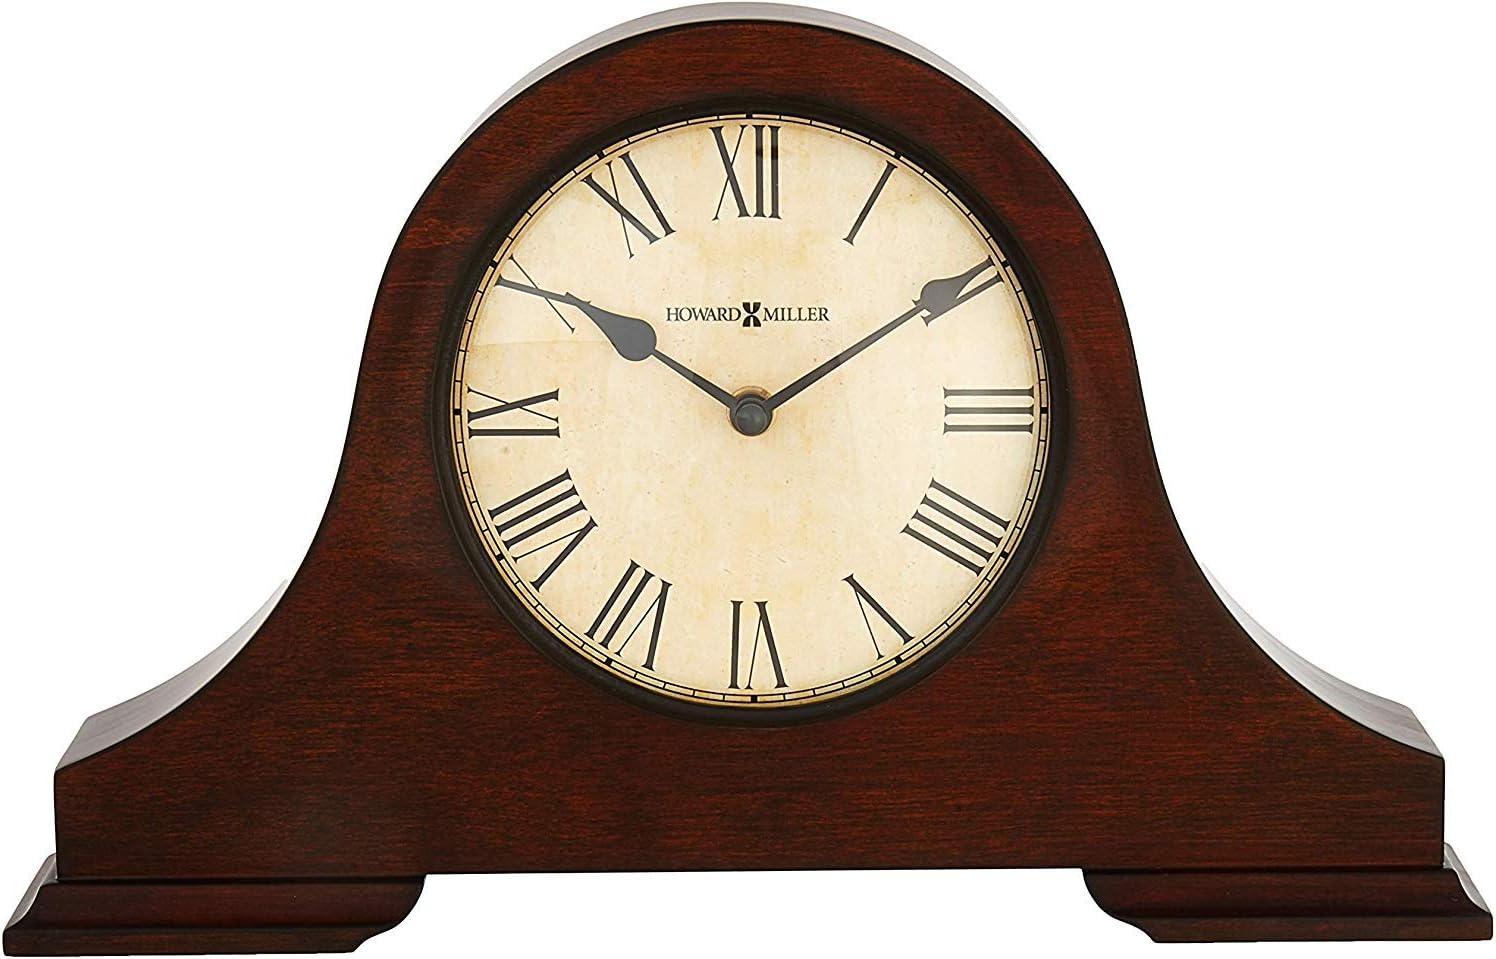 A picture of Howard Miller Humphrey Mantel Clock